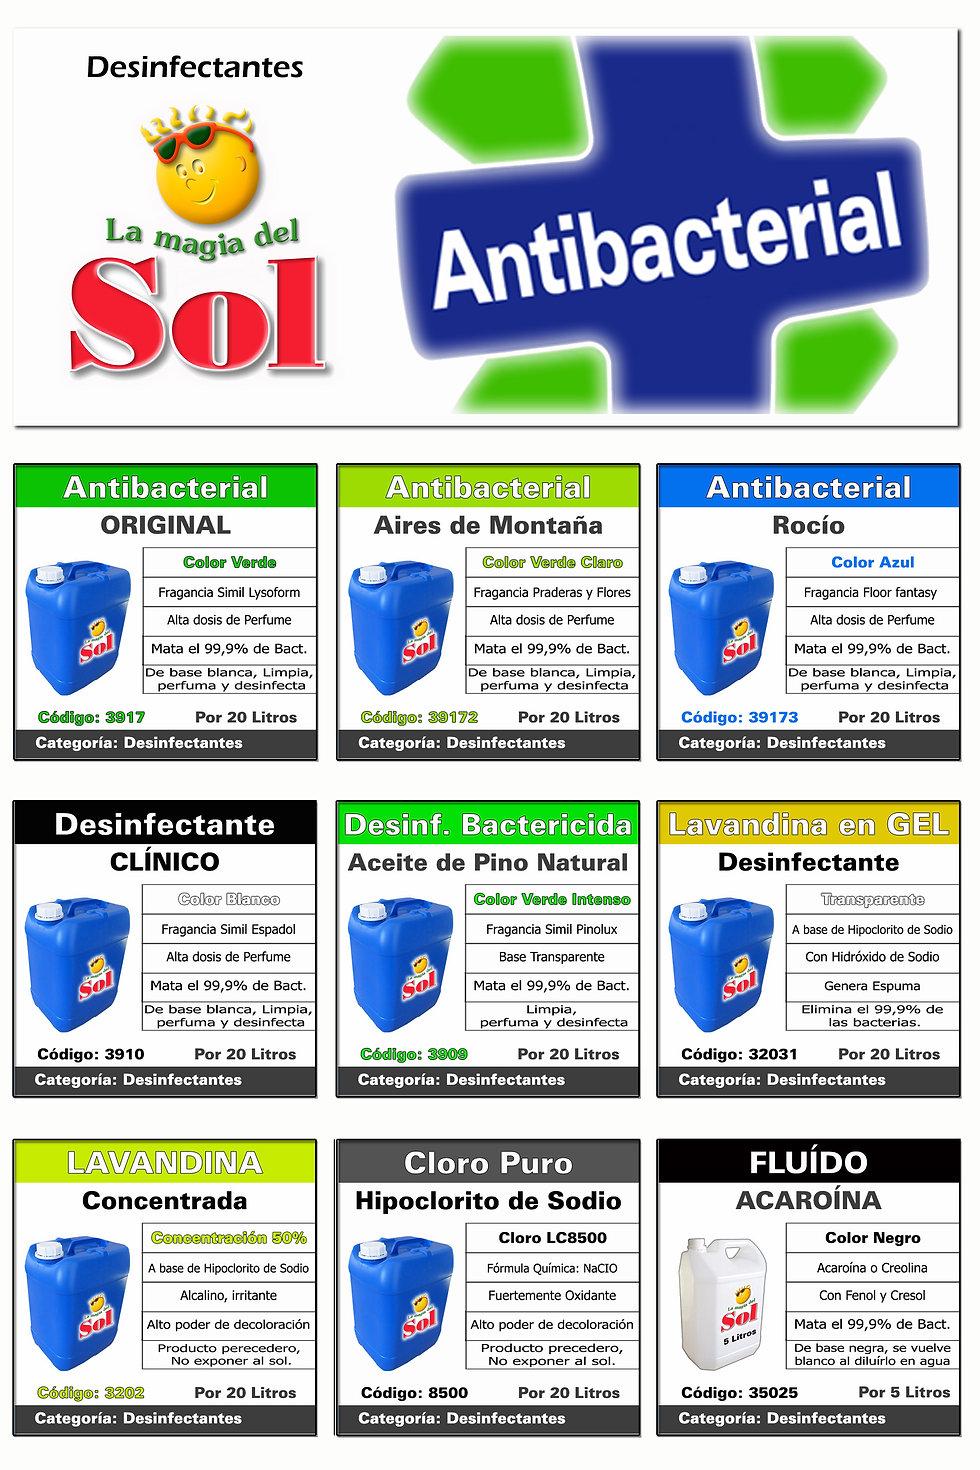 7 Desinfectantes.jpg